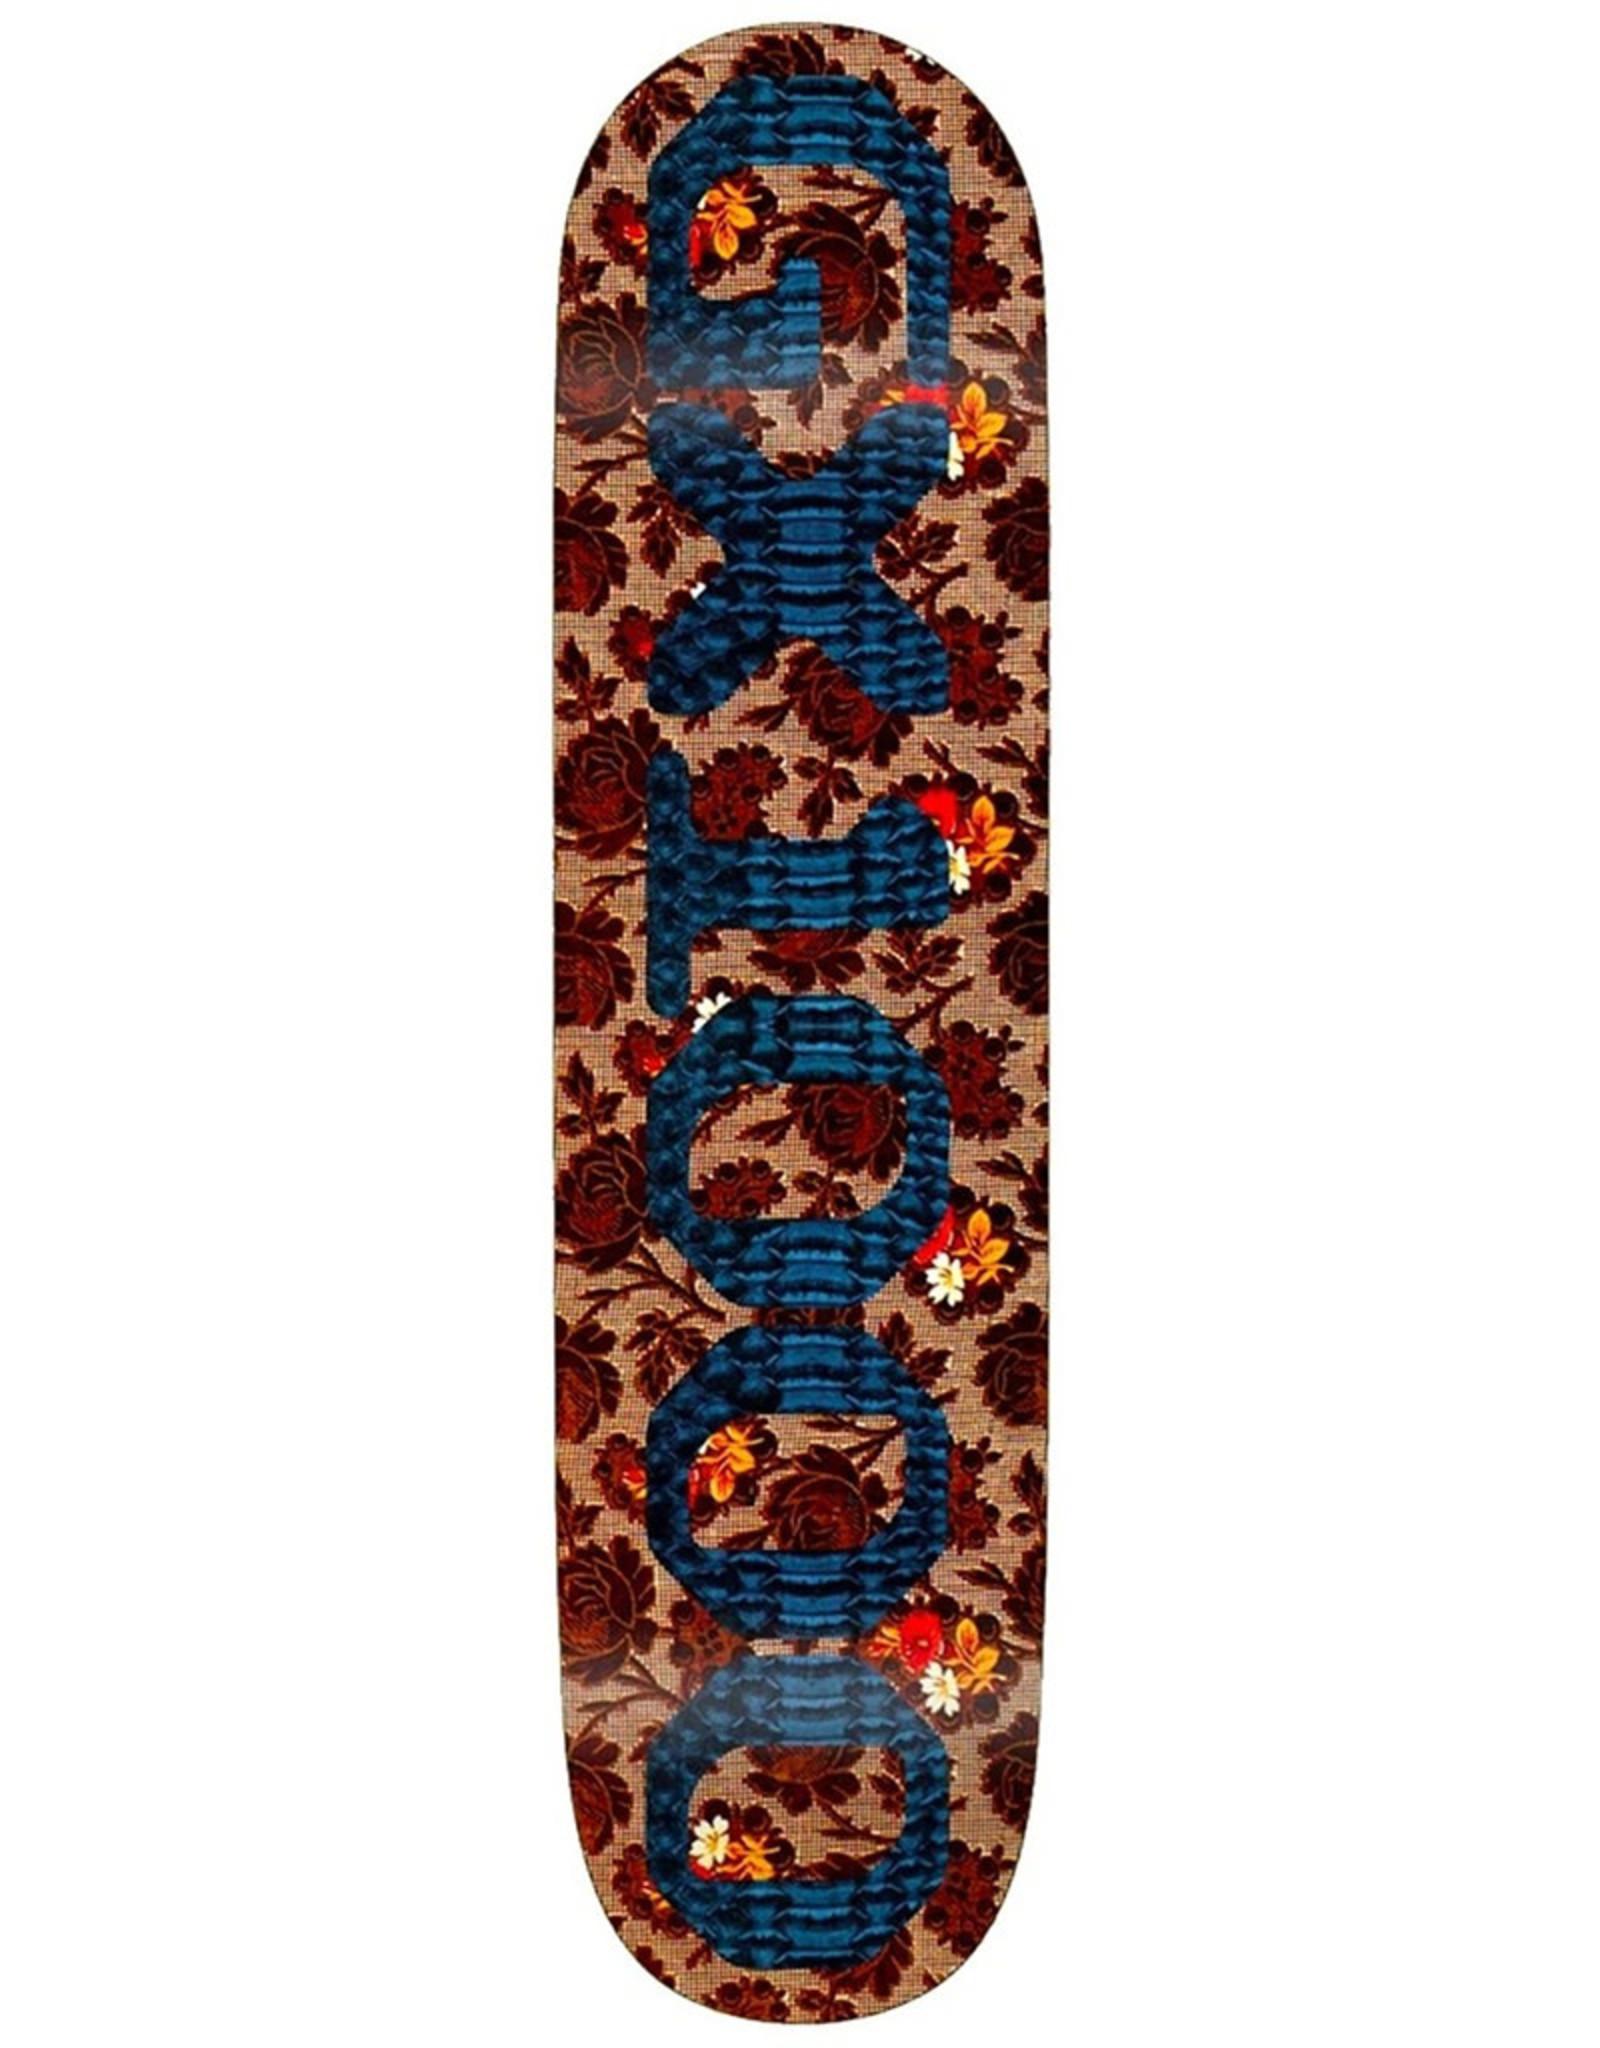 GX1000 GX-1000 Deck Team OG Scales Blue II (8.375)